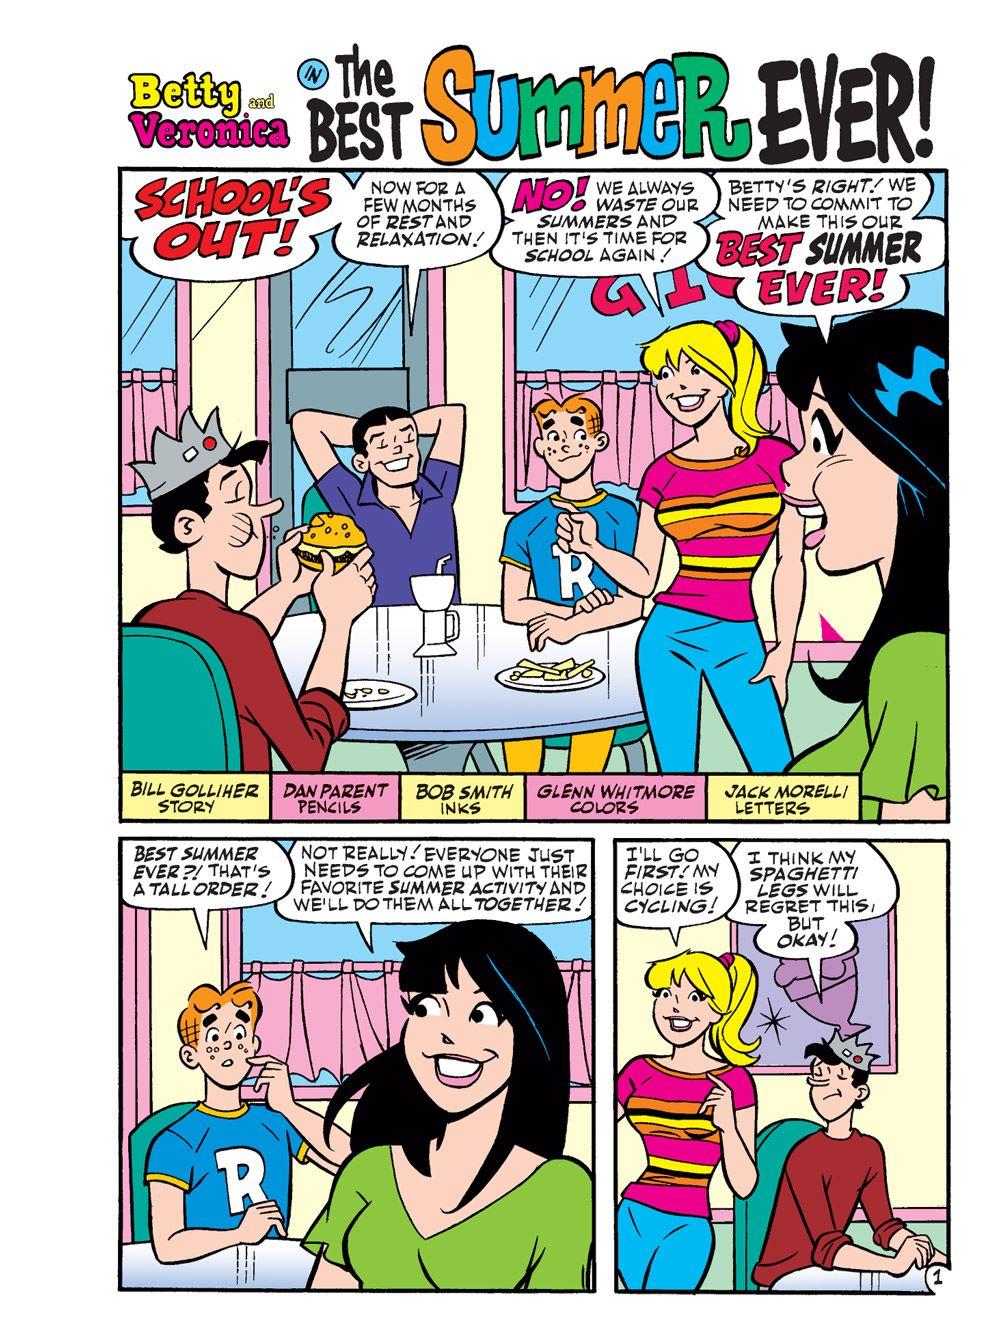 BettyAndVeronicaJumboComicsDigest_294-2 ComicList Previews: BETTY AND VERONICA JUMBO COMICS DIGEST #294